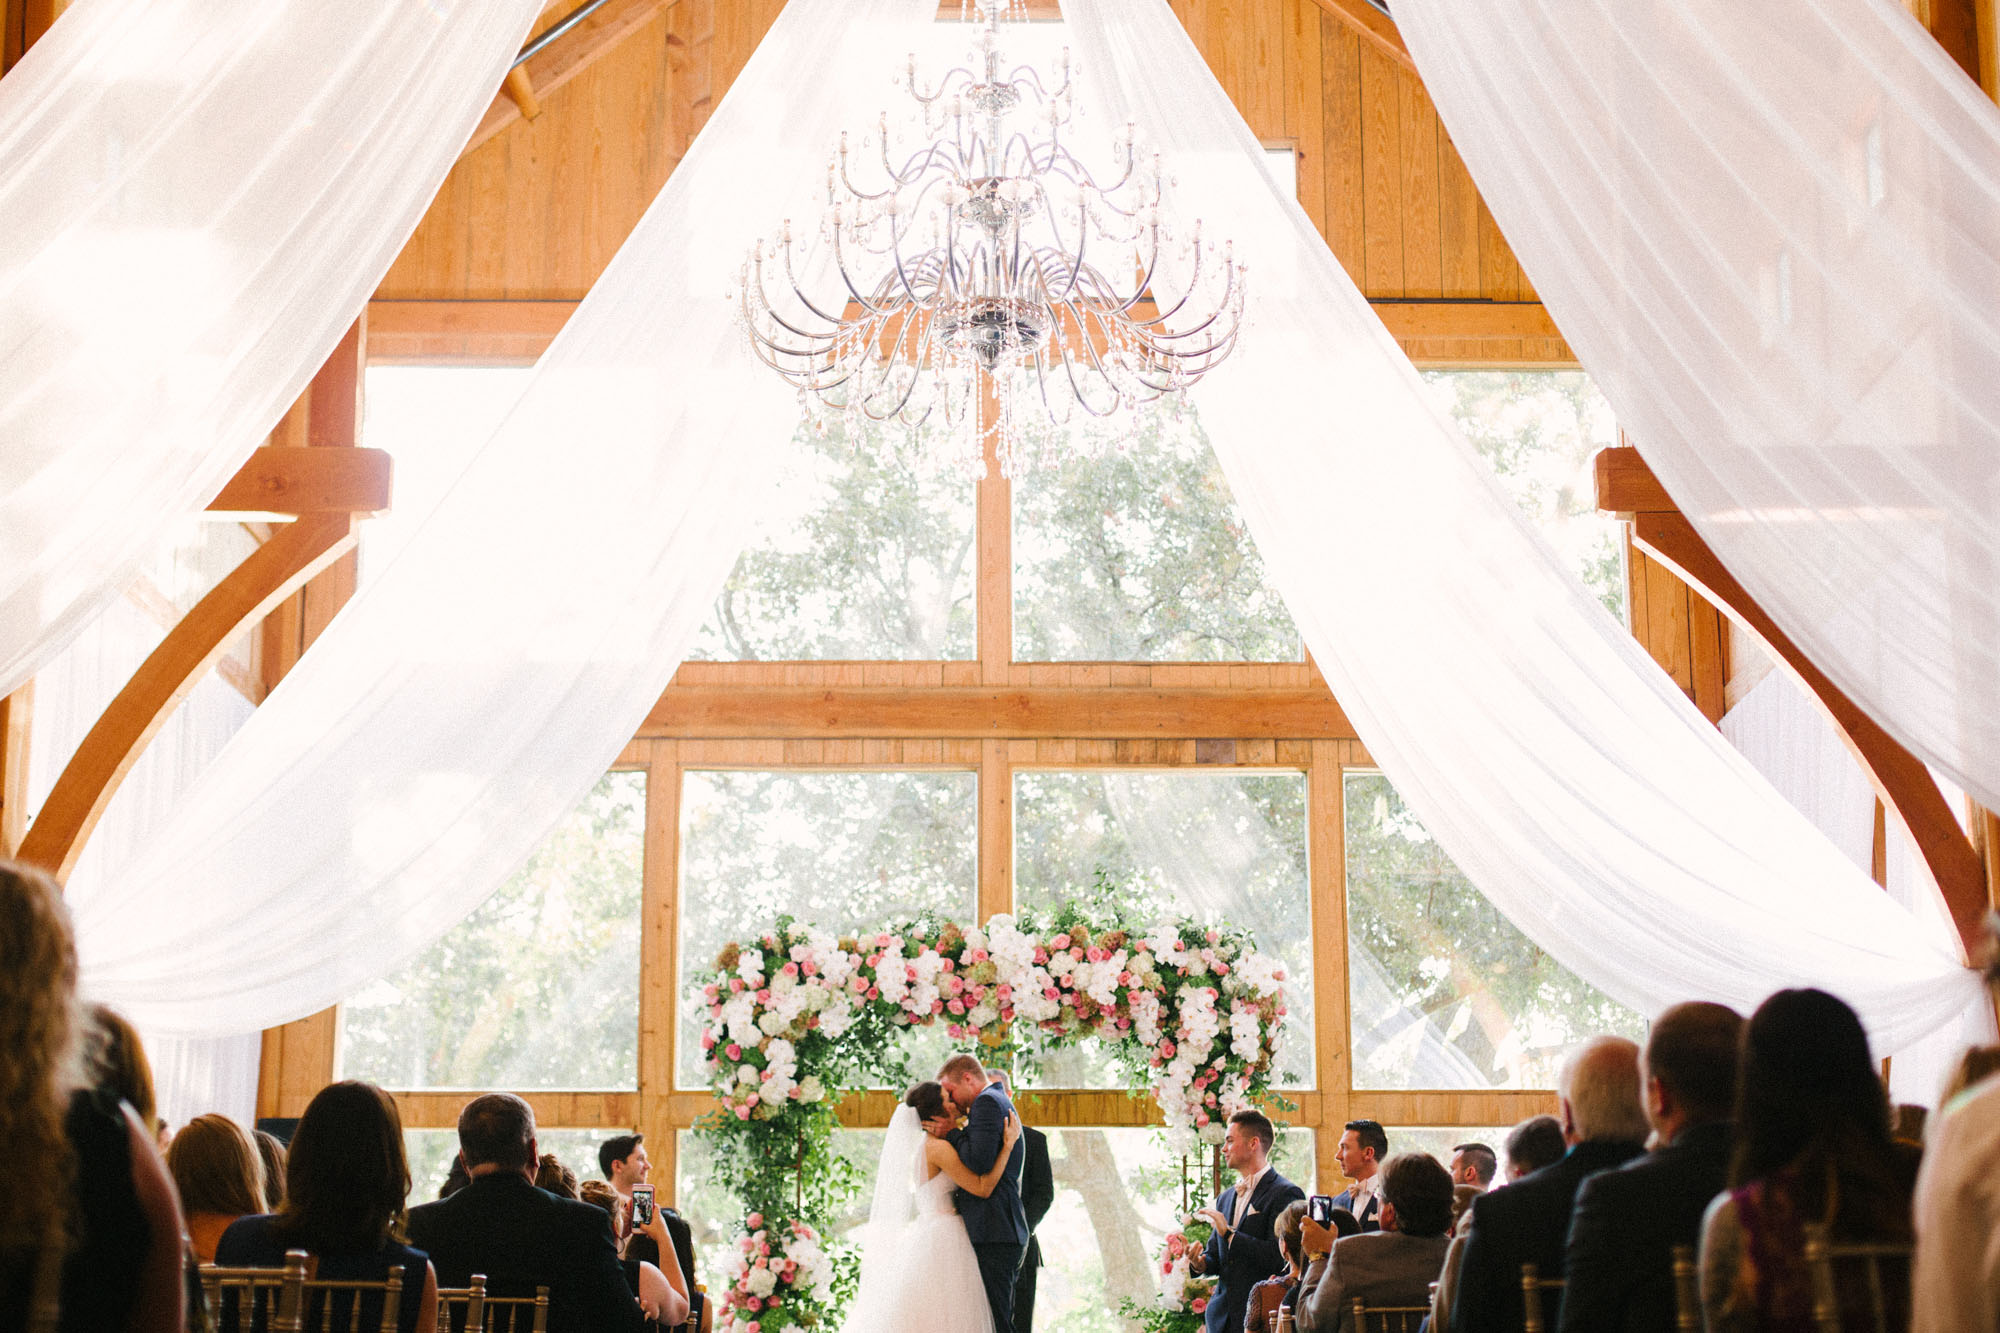 SM anna smith photography wedding photographer venue wedding planner-502.jpg